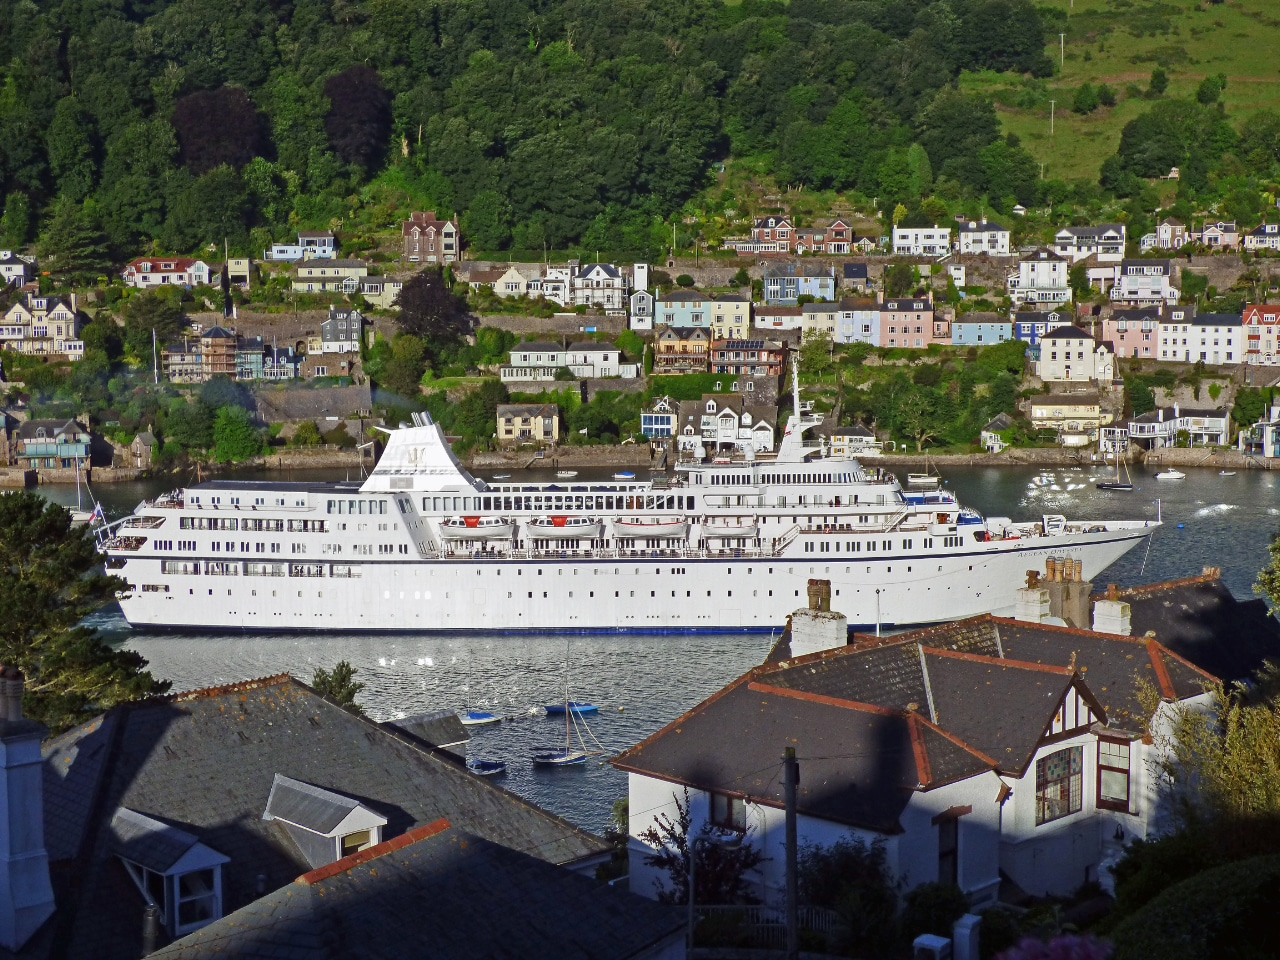 Aegean Odyssey in Dartmouth